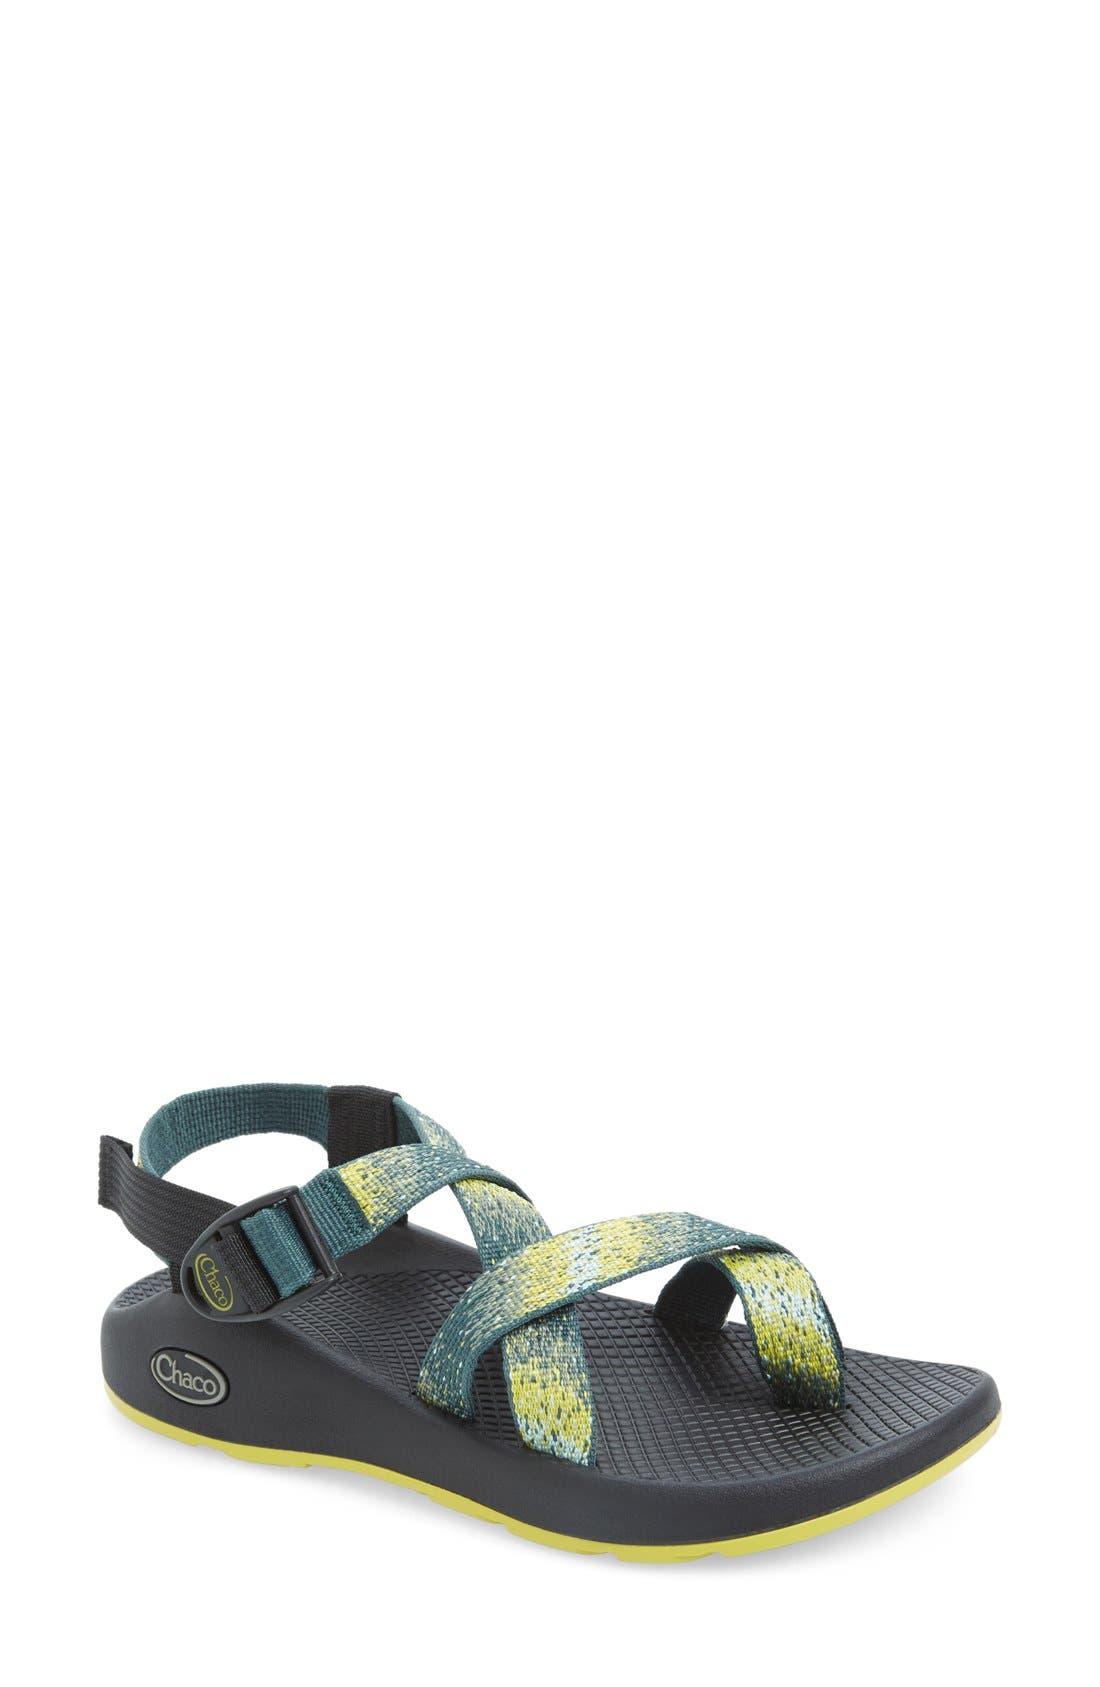 Main Image - Chaco 'Z2 Yampa' Sandal